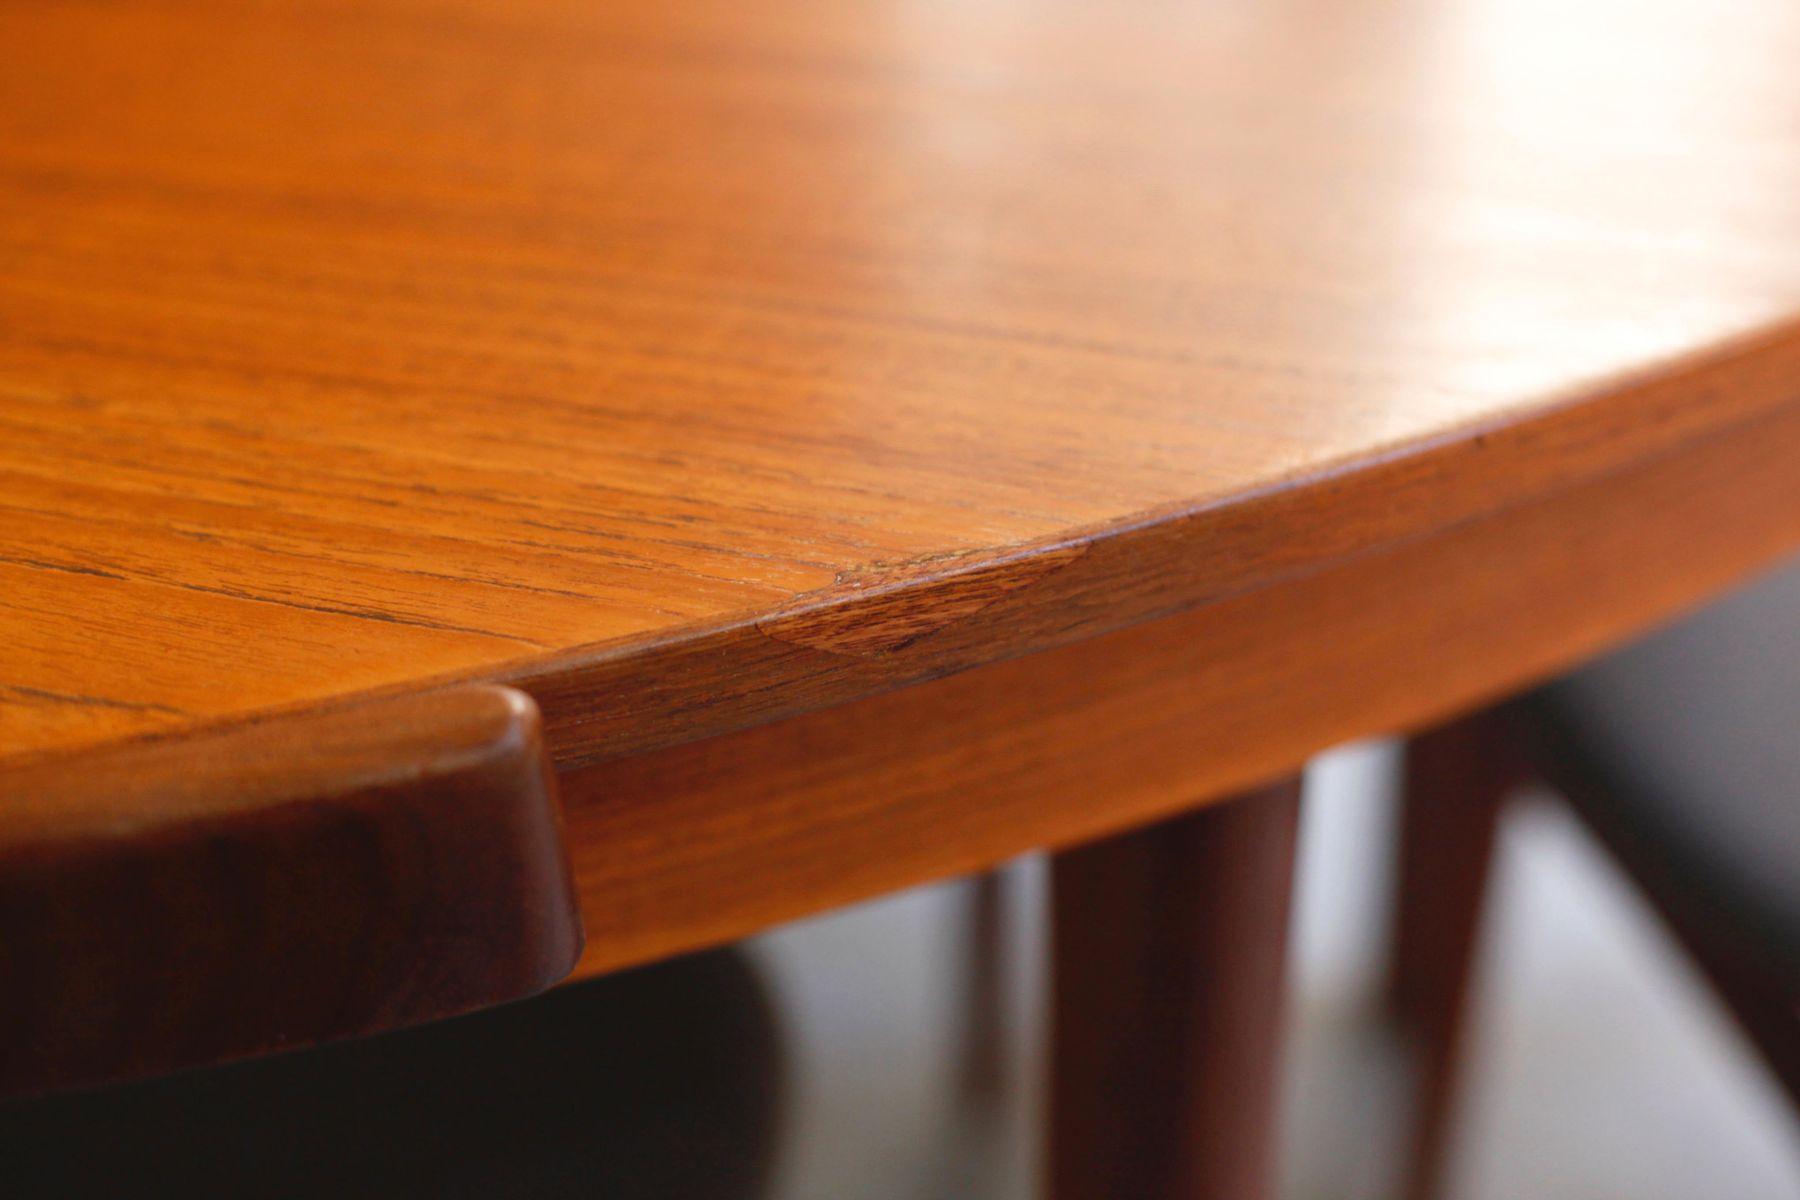 Teak Dining Table Set by Hans Olsen for Frem R248jle 1952  : teak dining table set by hans olsen for frem rojle 1952 8 from www.pamono.co.uk size 1800 x 1200 jpeg 91kB